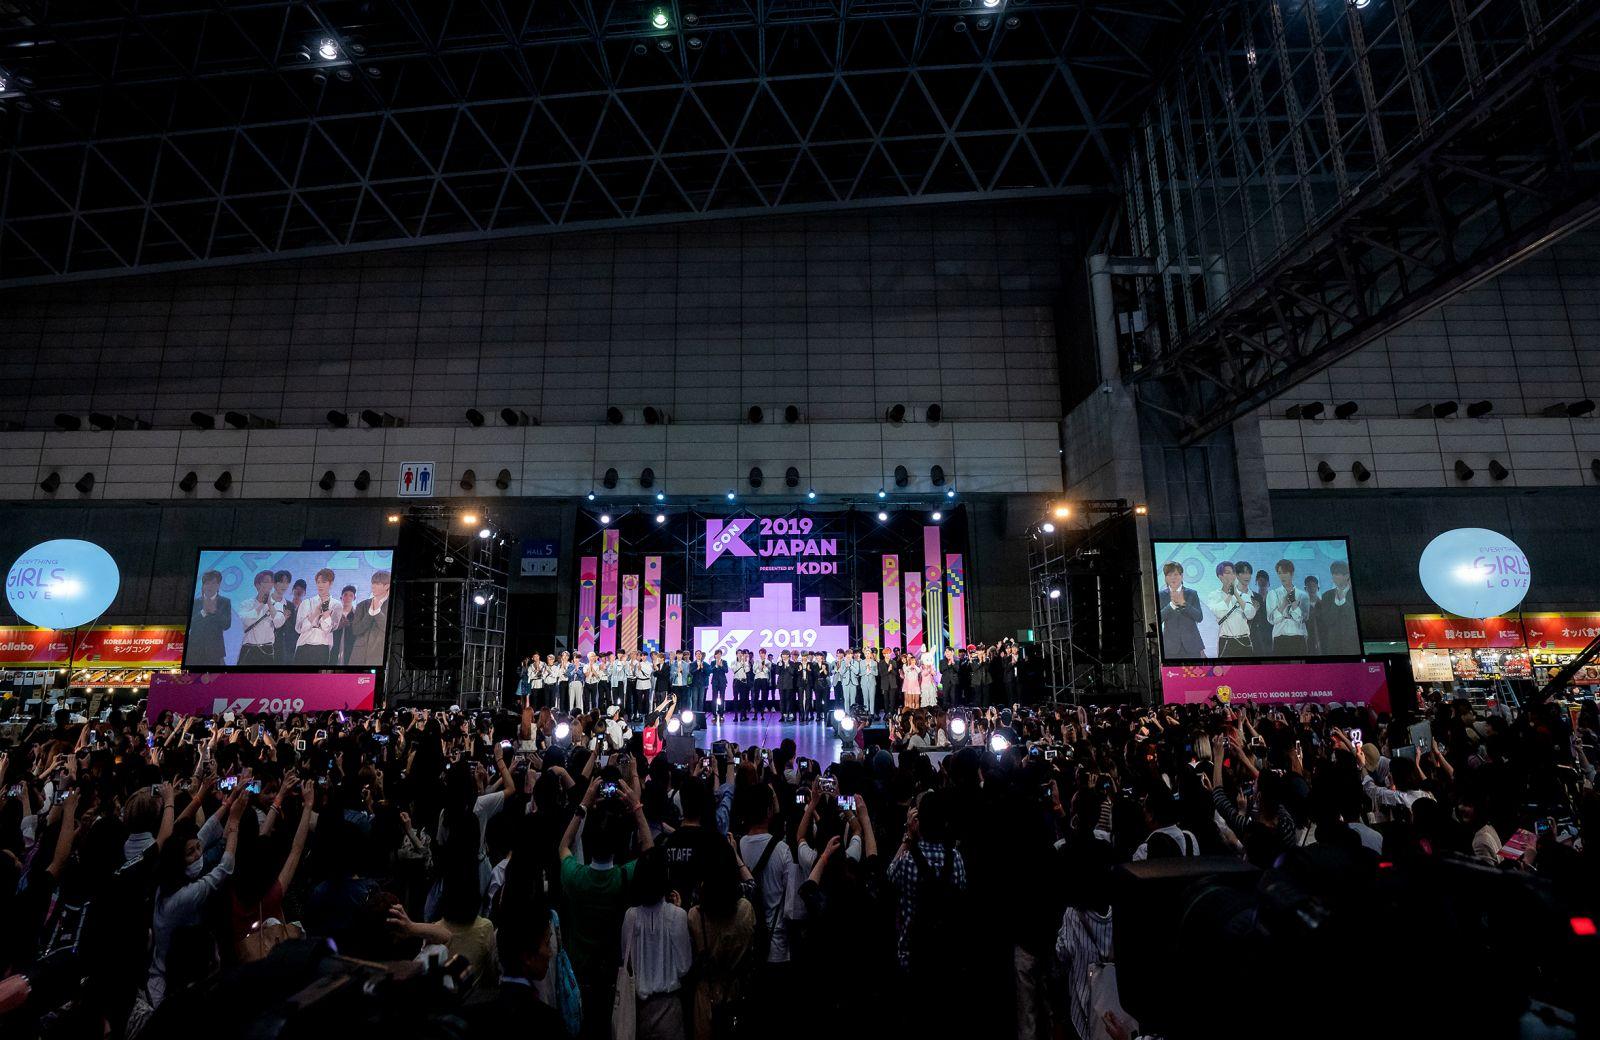 KCON,コンベンション,オープニングセレモニー